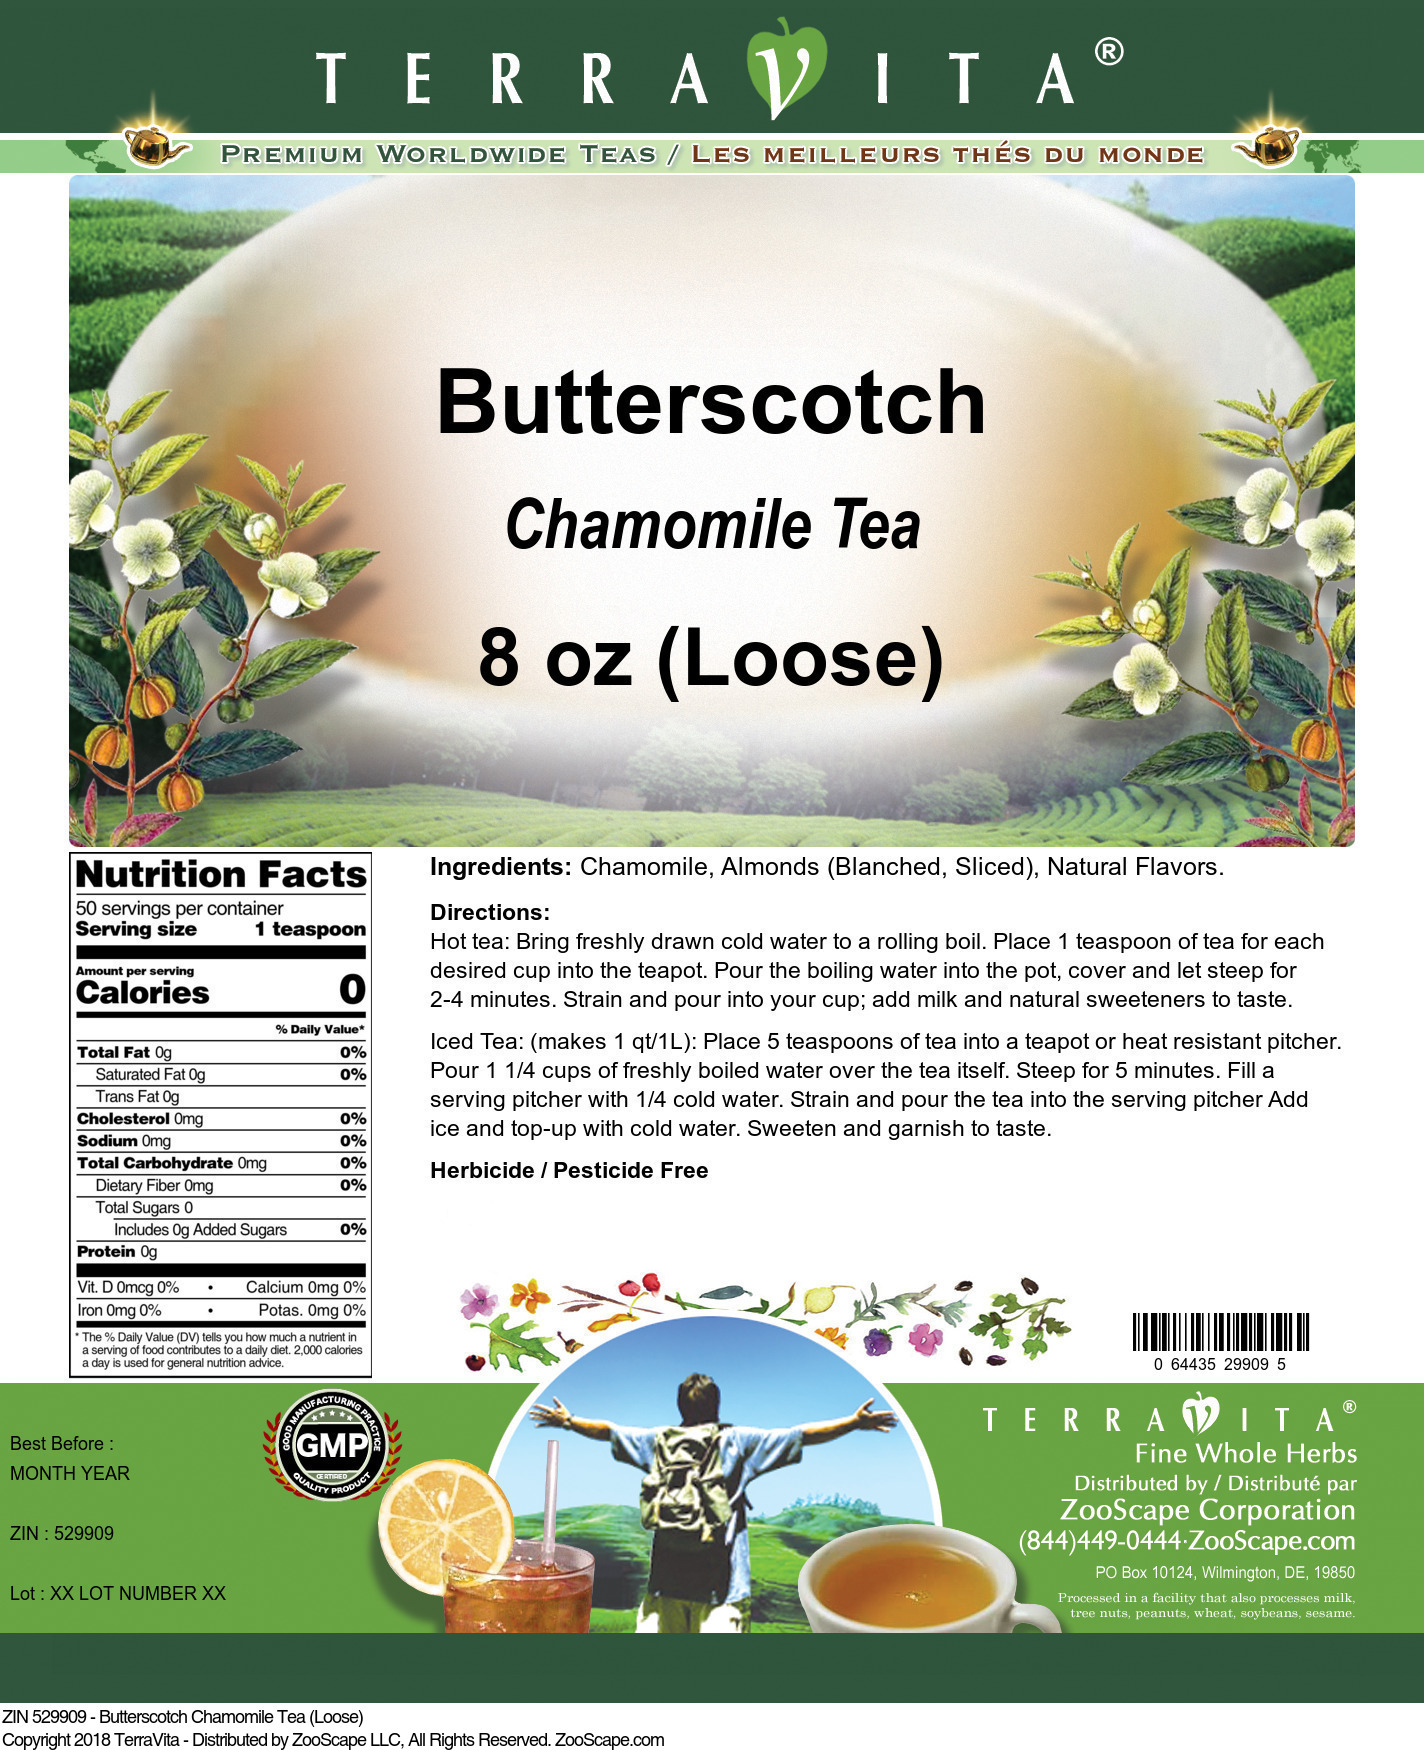 Butterscotch Chamomile Tea (Loose)